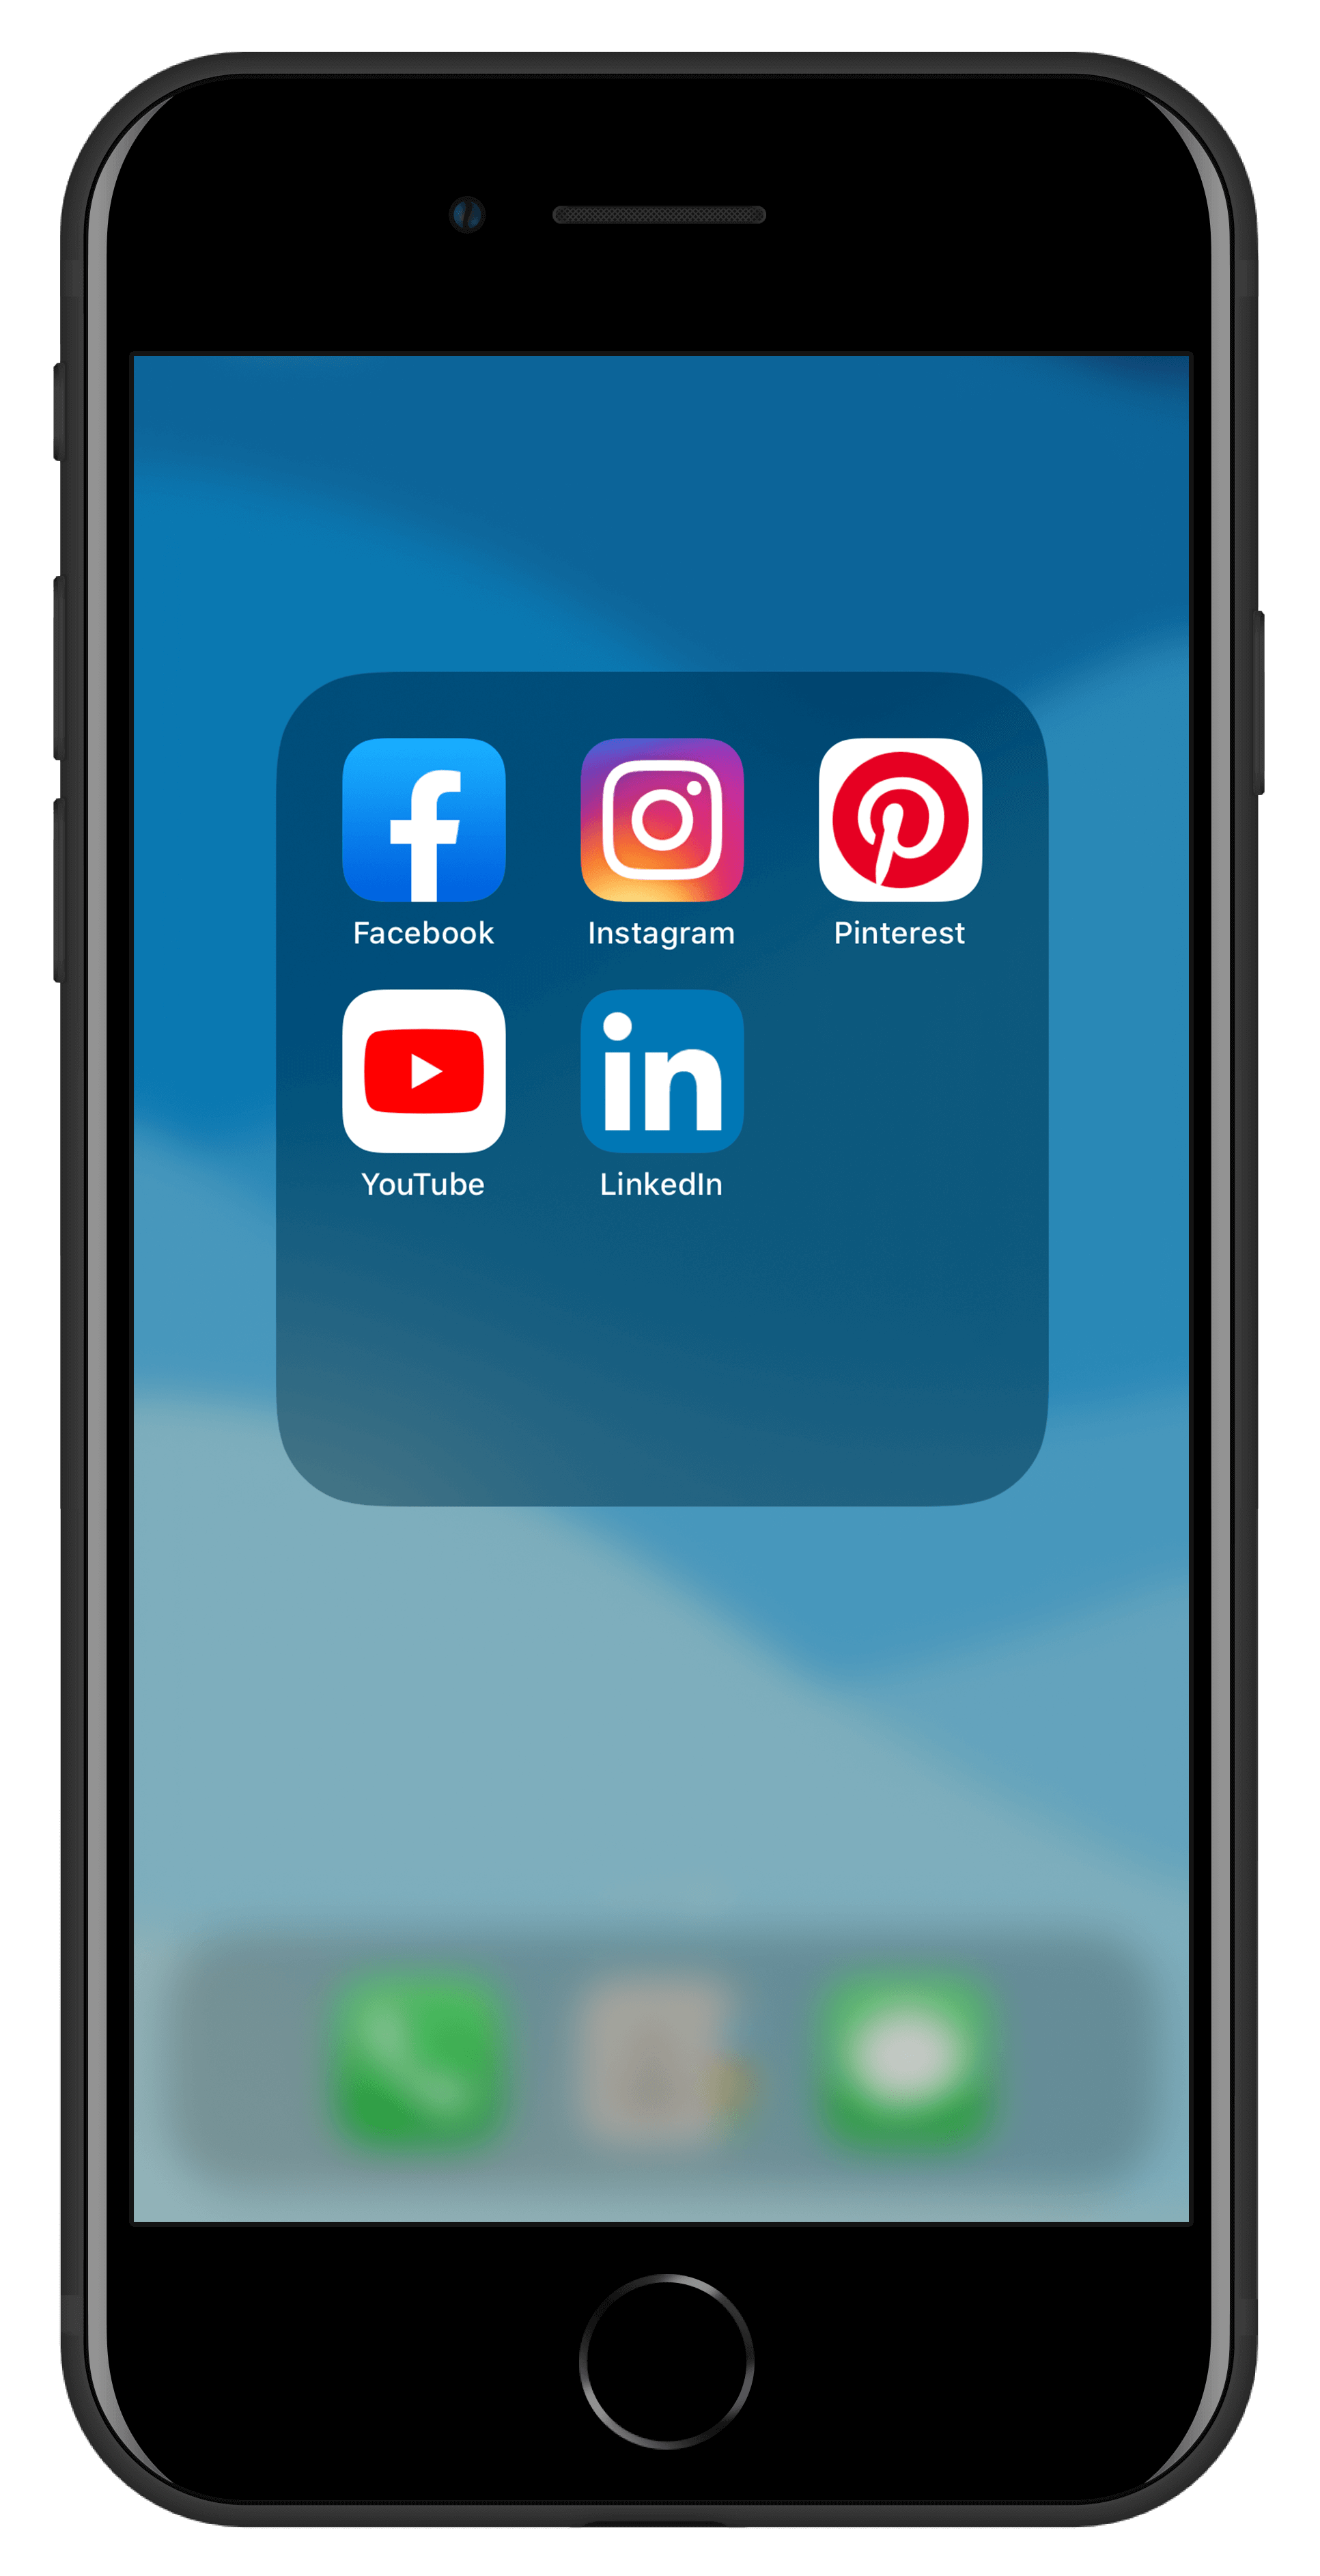 Phone screen displaying social media platforms - Facebook, Instagram, Pinterest, Youtube, LinkedIn